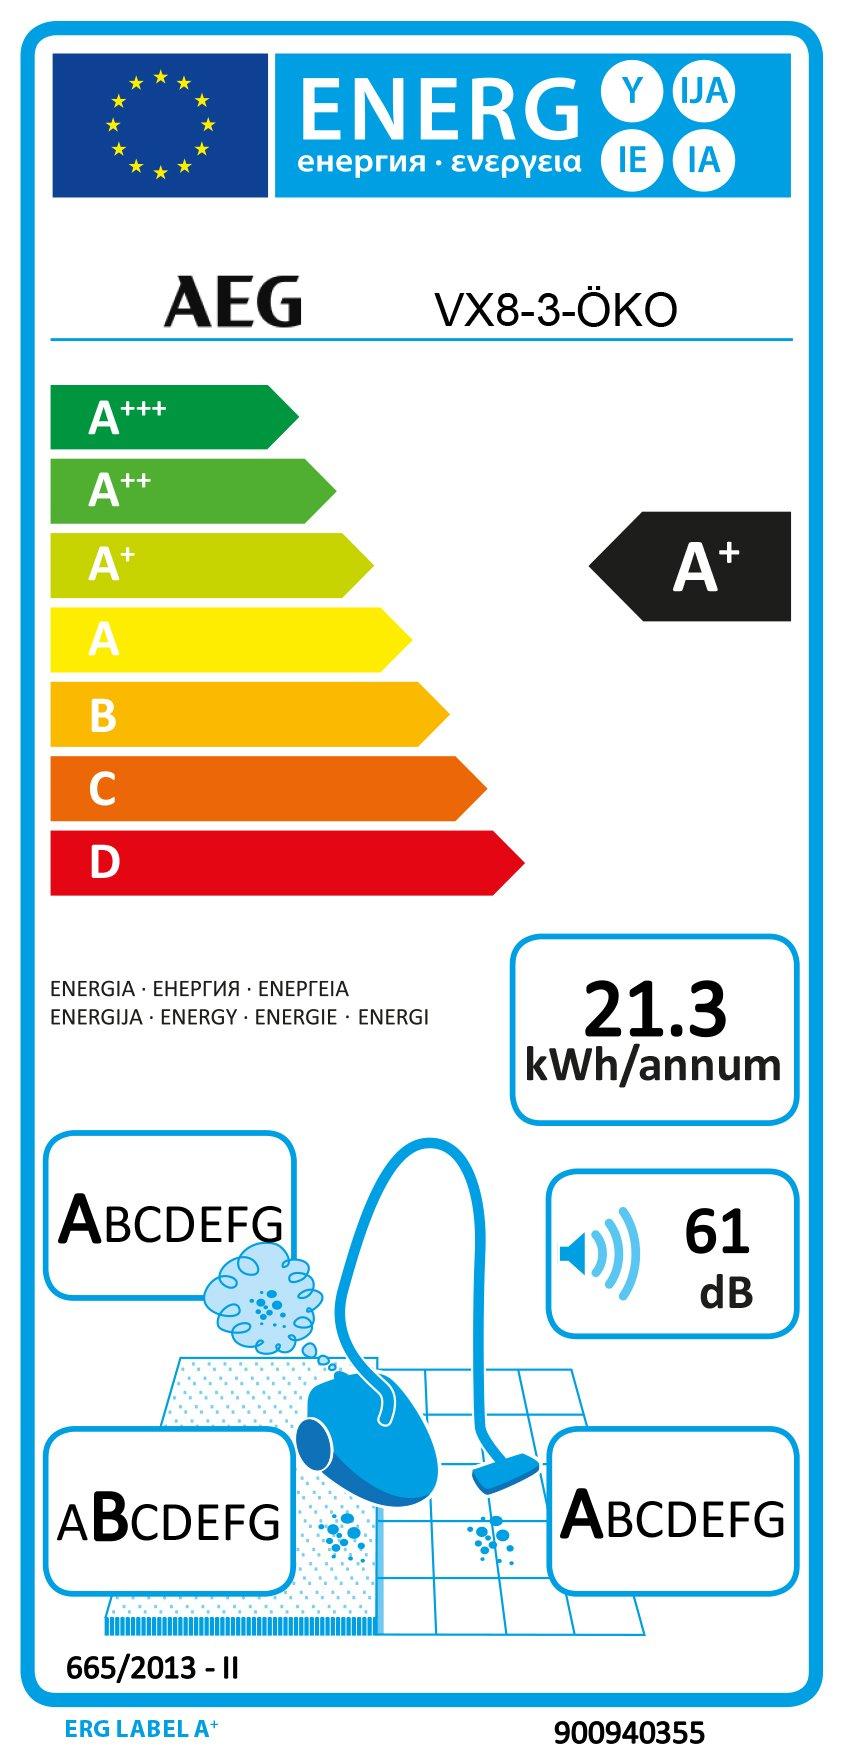 AEG VX8-3-ÖKO Staubsauger mit Beutel (55% Recyclingmaterial, inkl. Zusatzdüsen, 600 W, nur 61 dB(A), 12 m Aktionsradius…